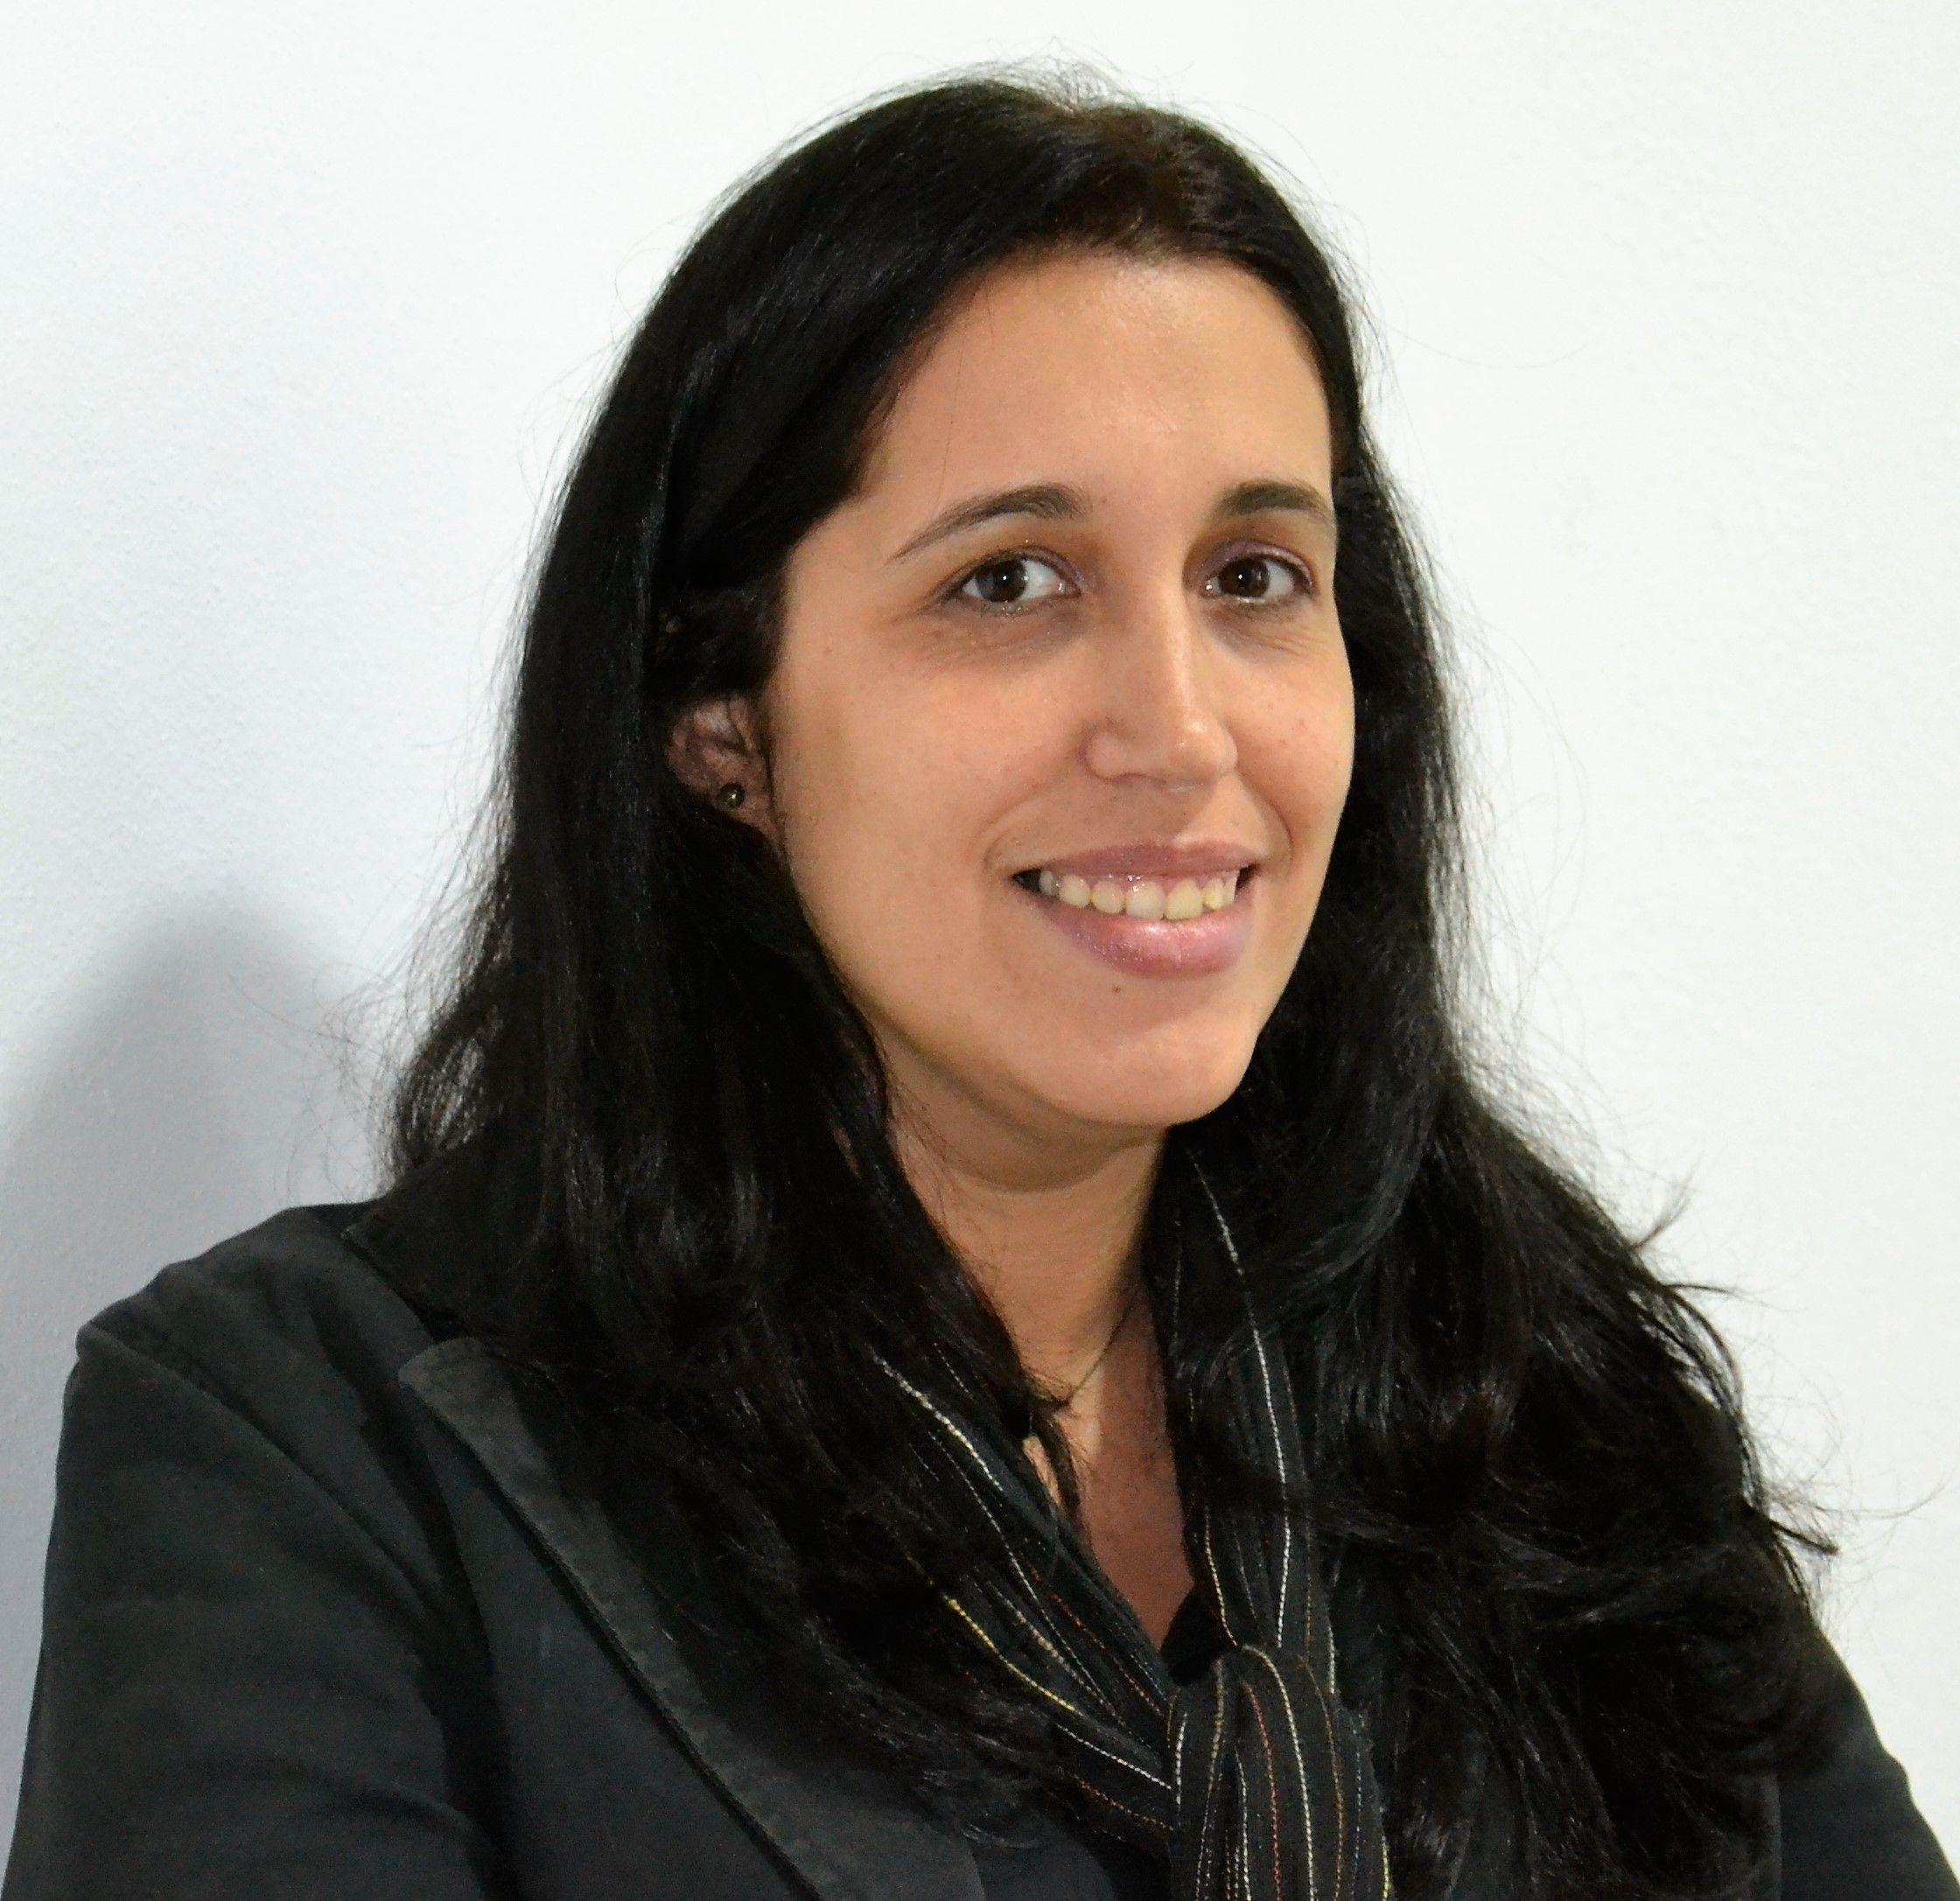 Micaela Almeida